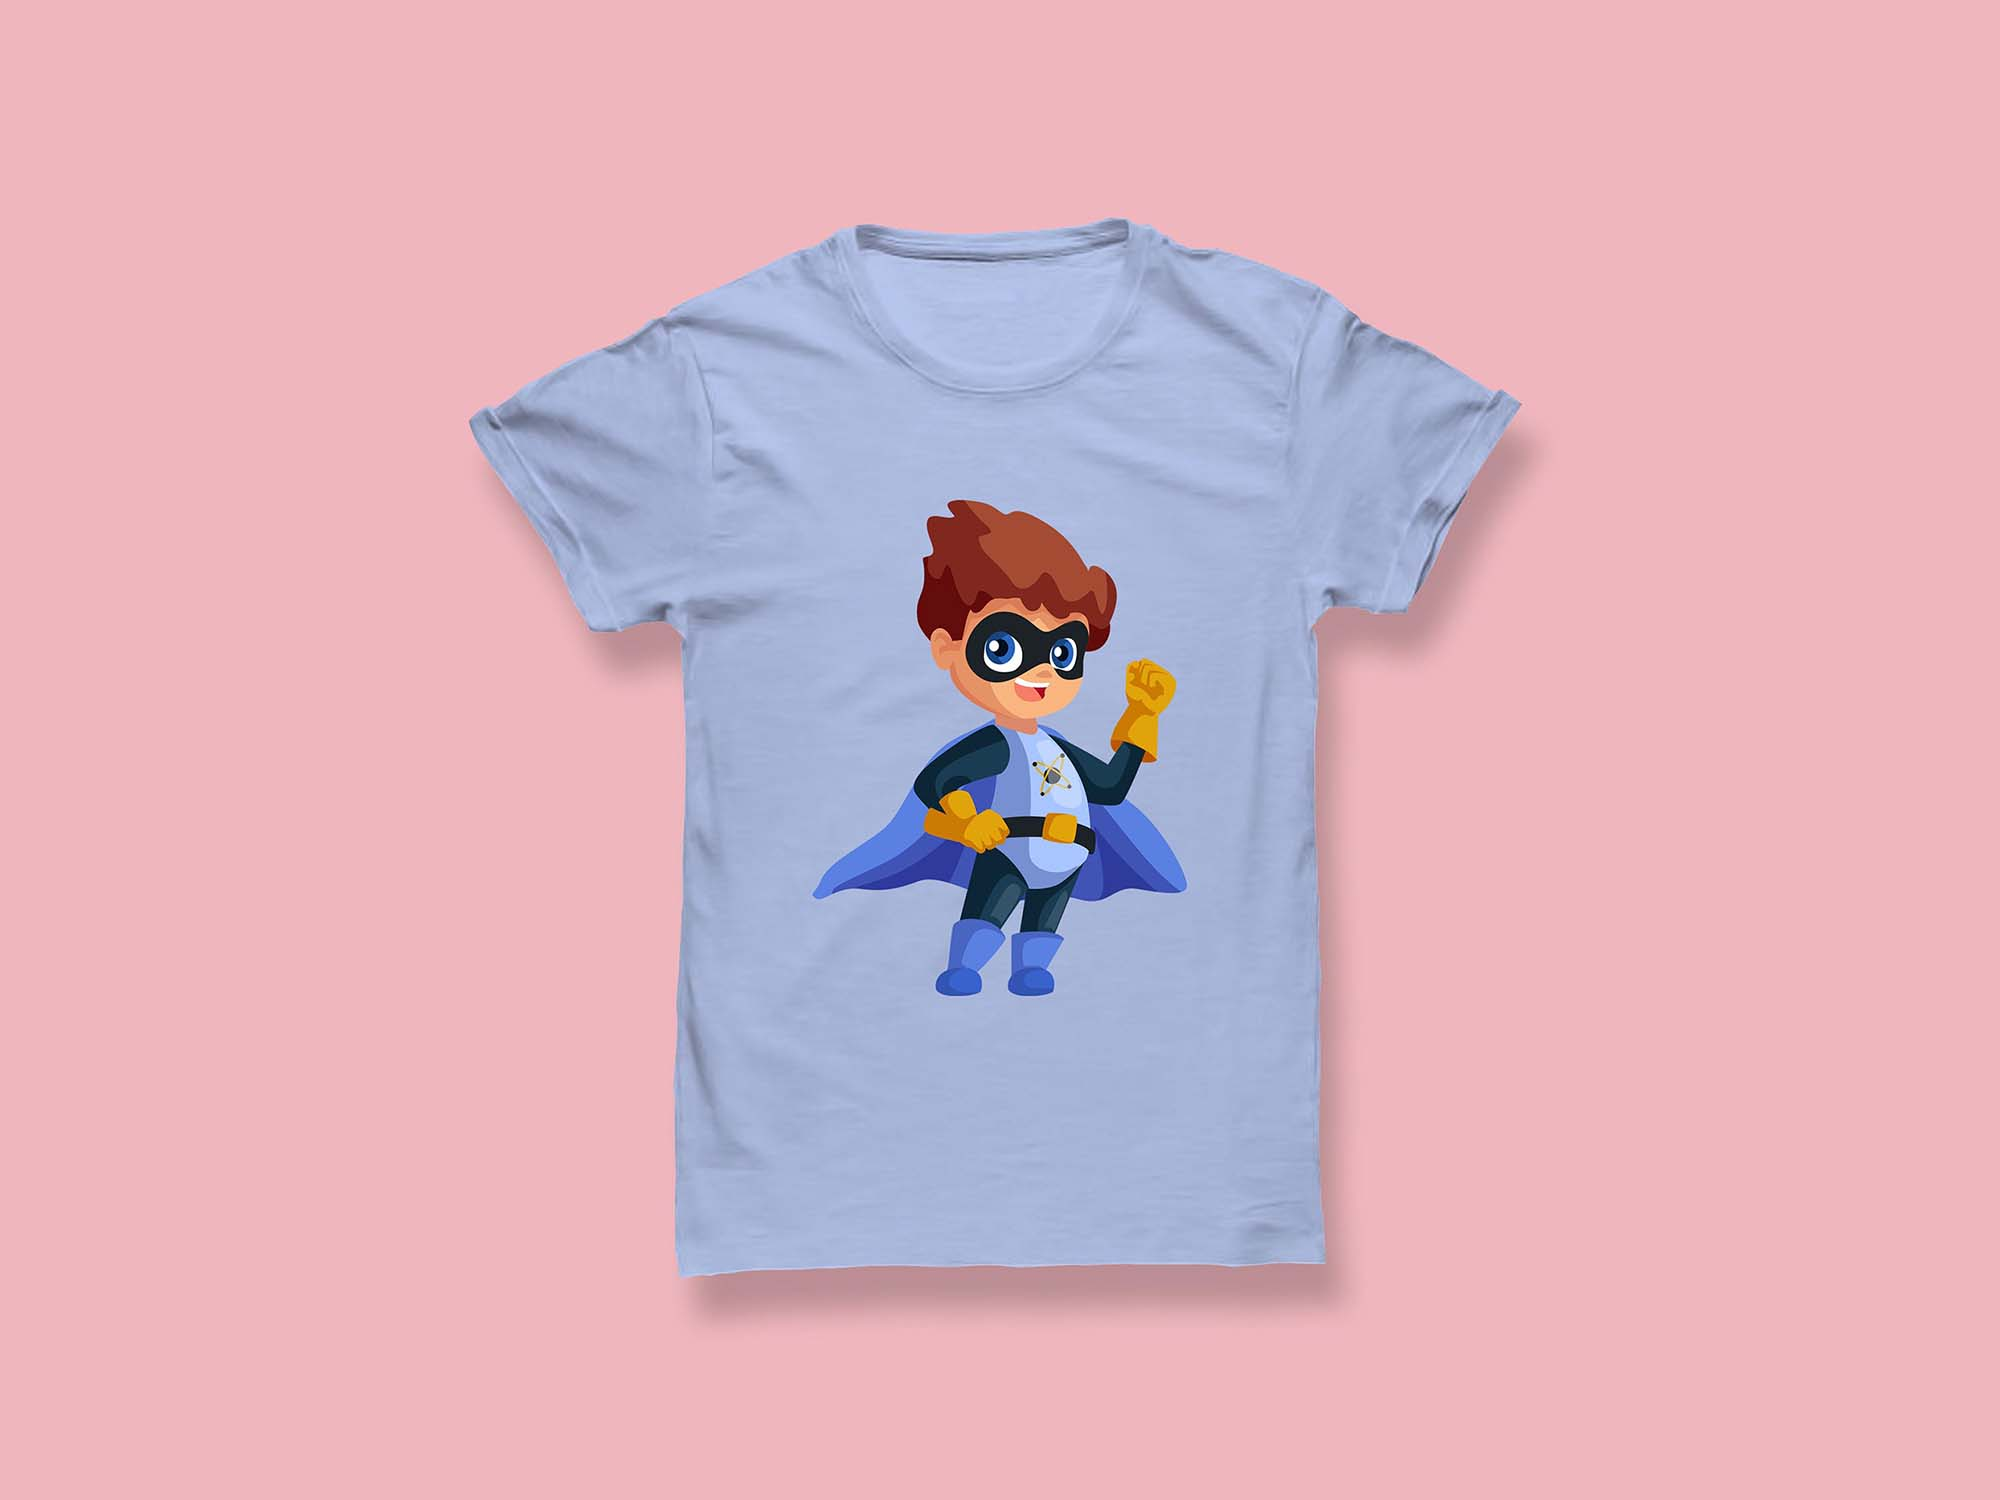 T-shirt Mockup For Men 2